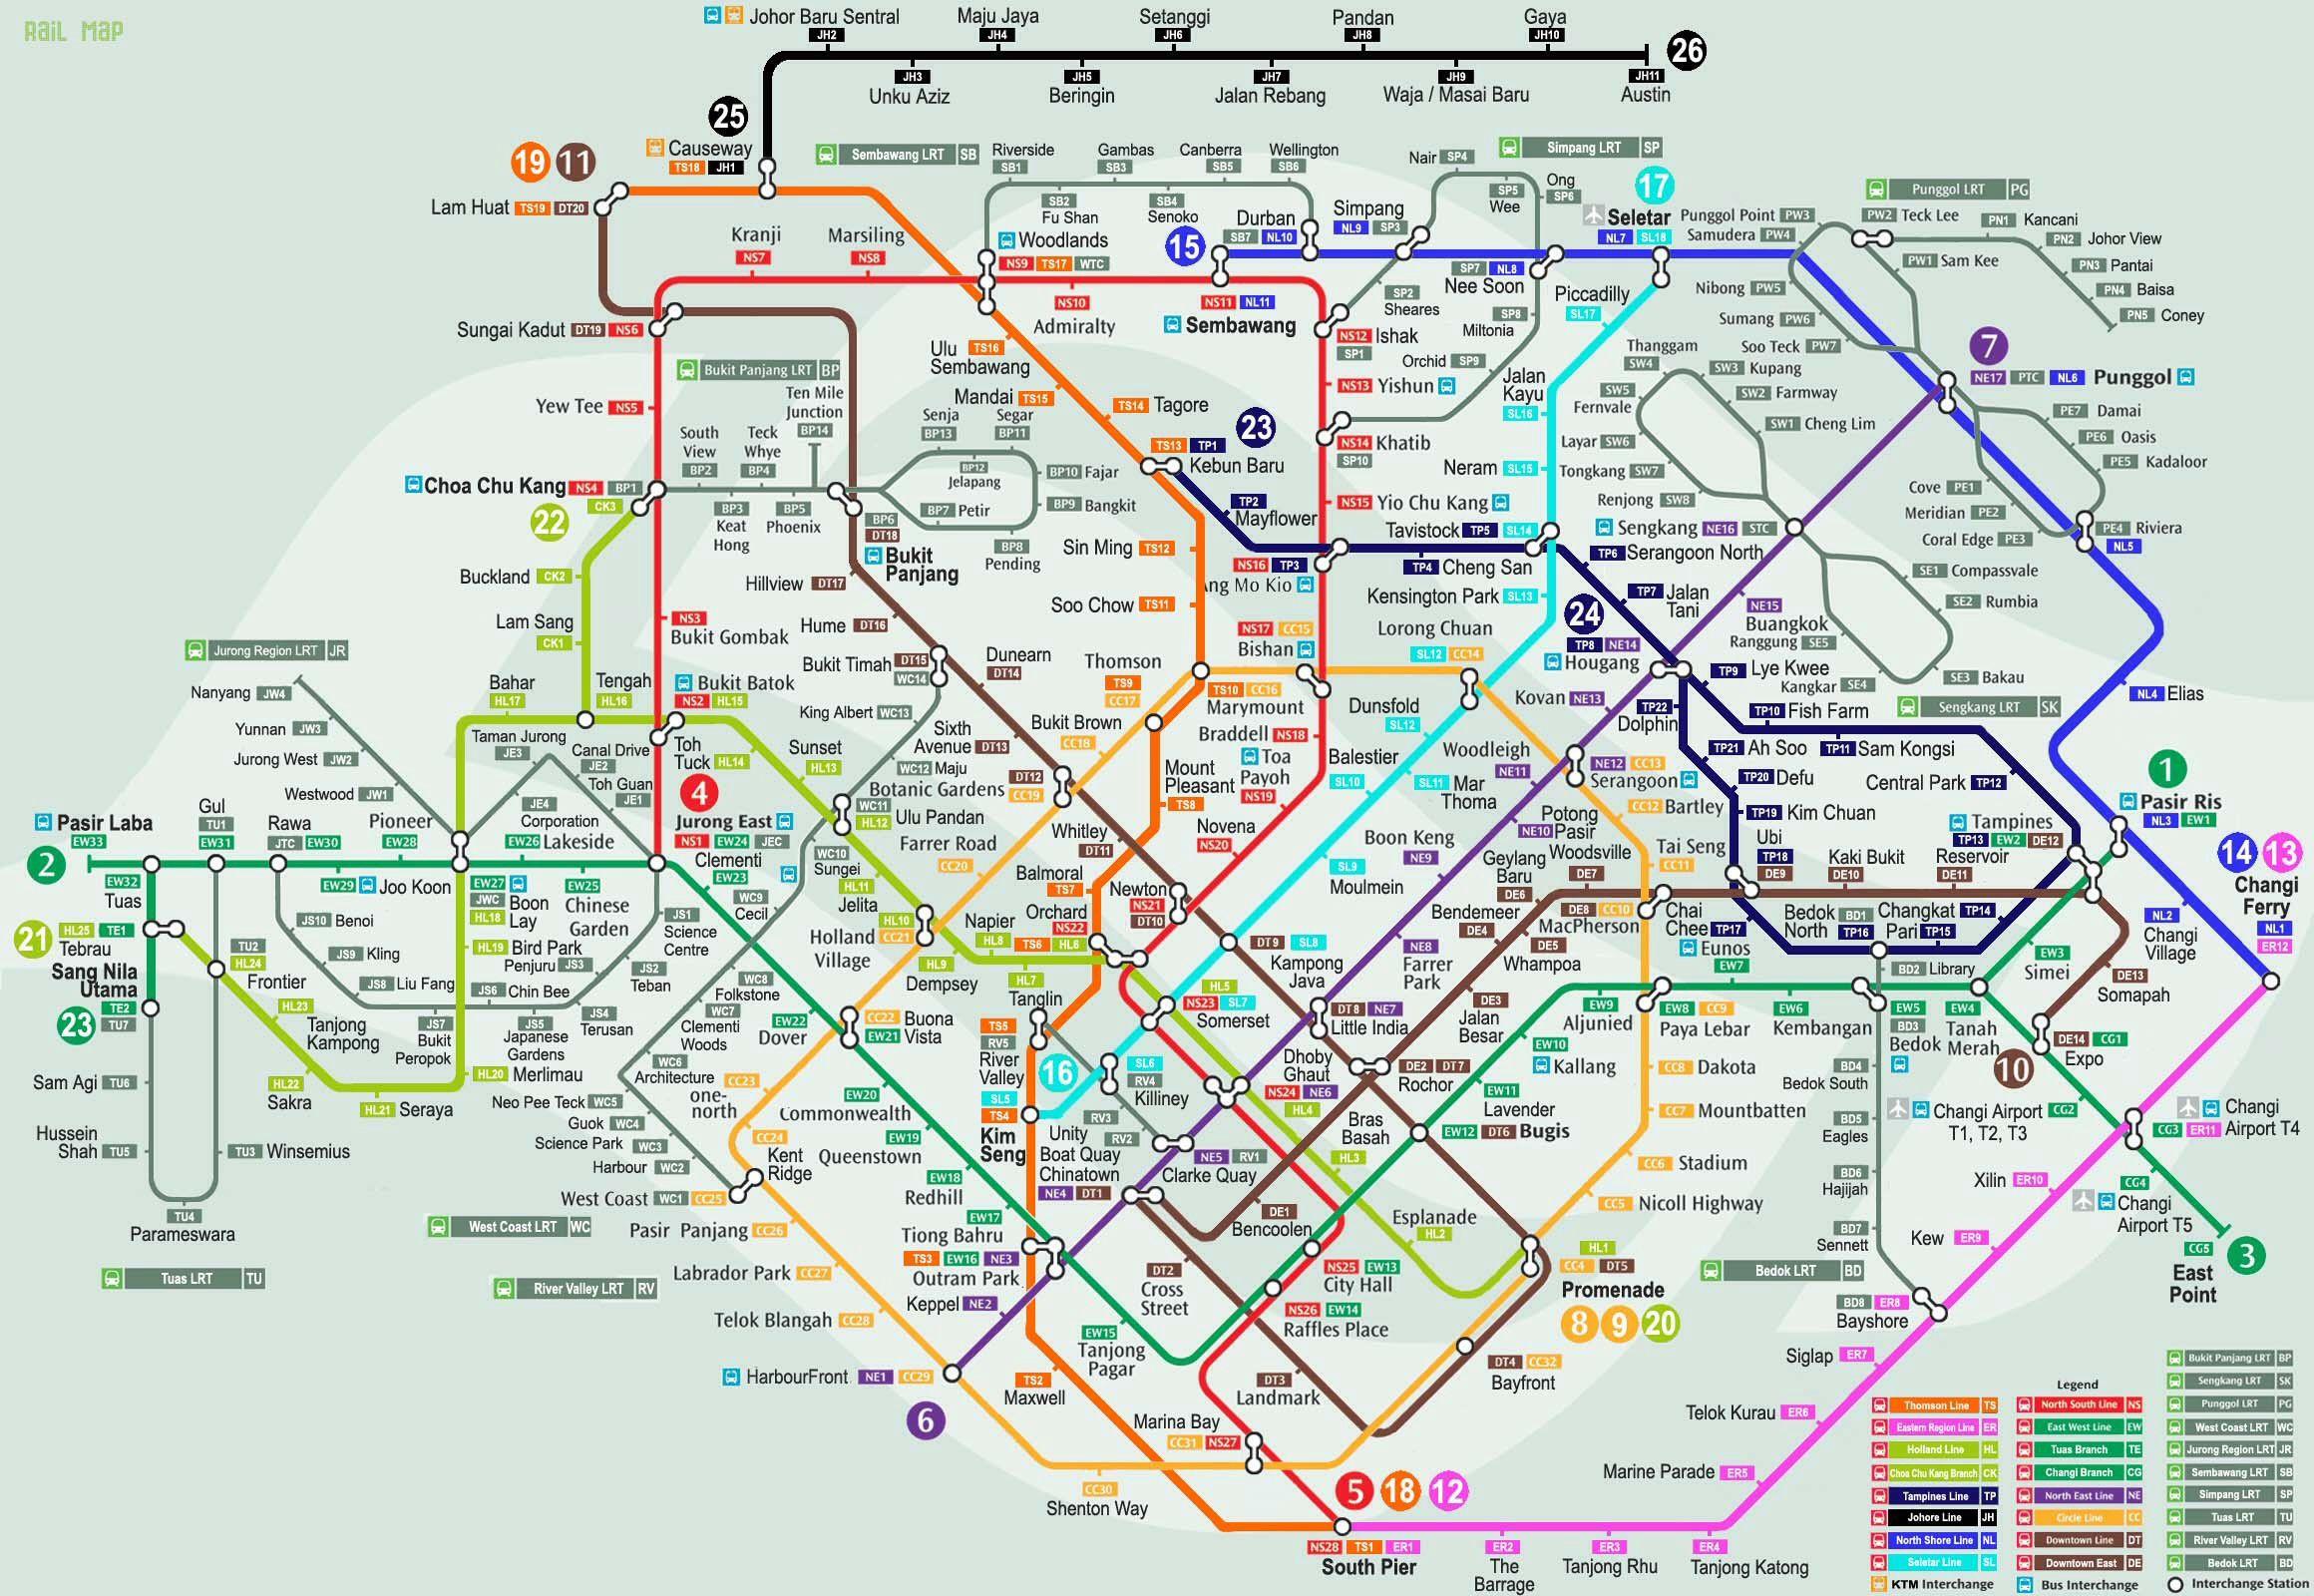 Singapore Mrt Map | Traveling | Singapore Map, Asia Map, Train Map - Singapore Mrt Map Printable